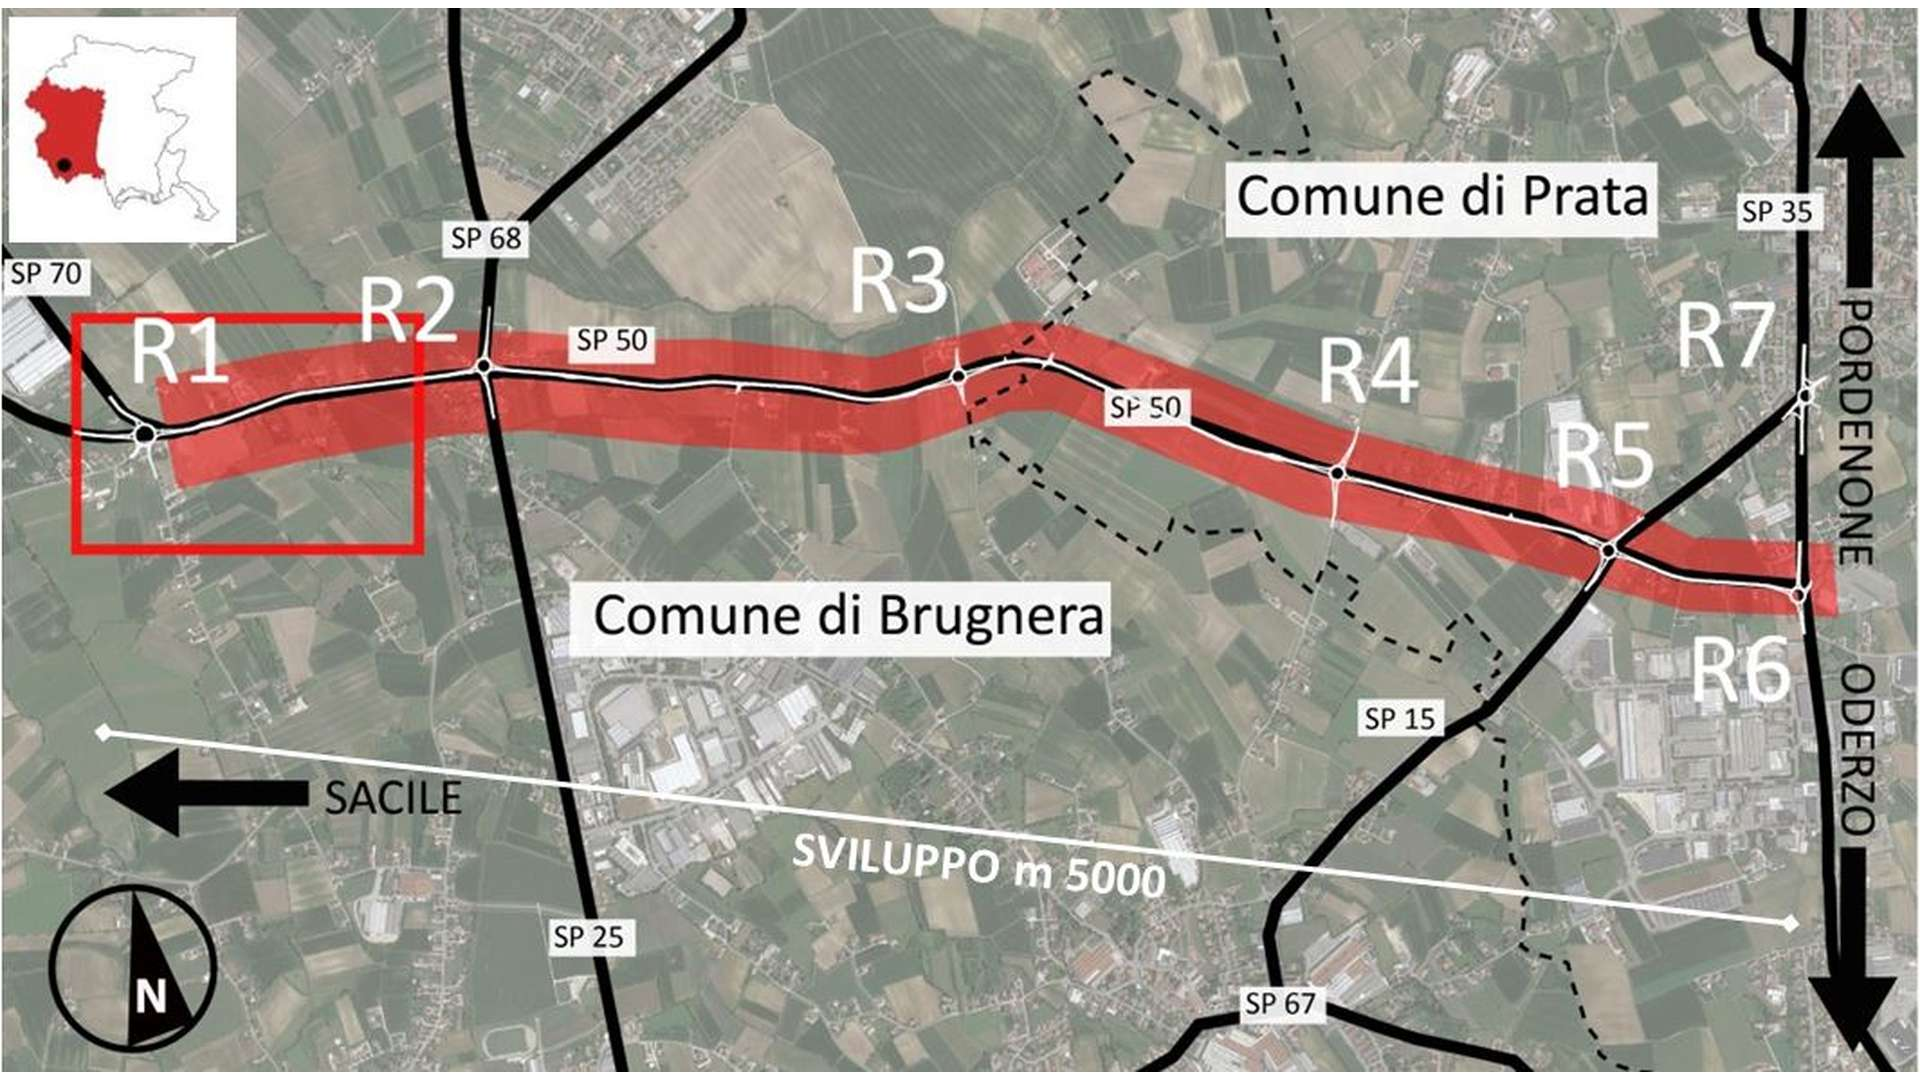 Brugnera Prata 004 E-Farm studio ingegneria Padova